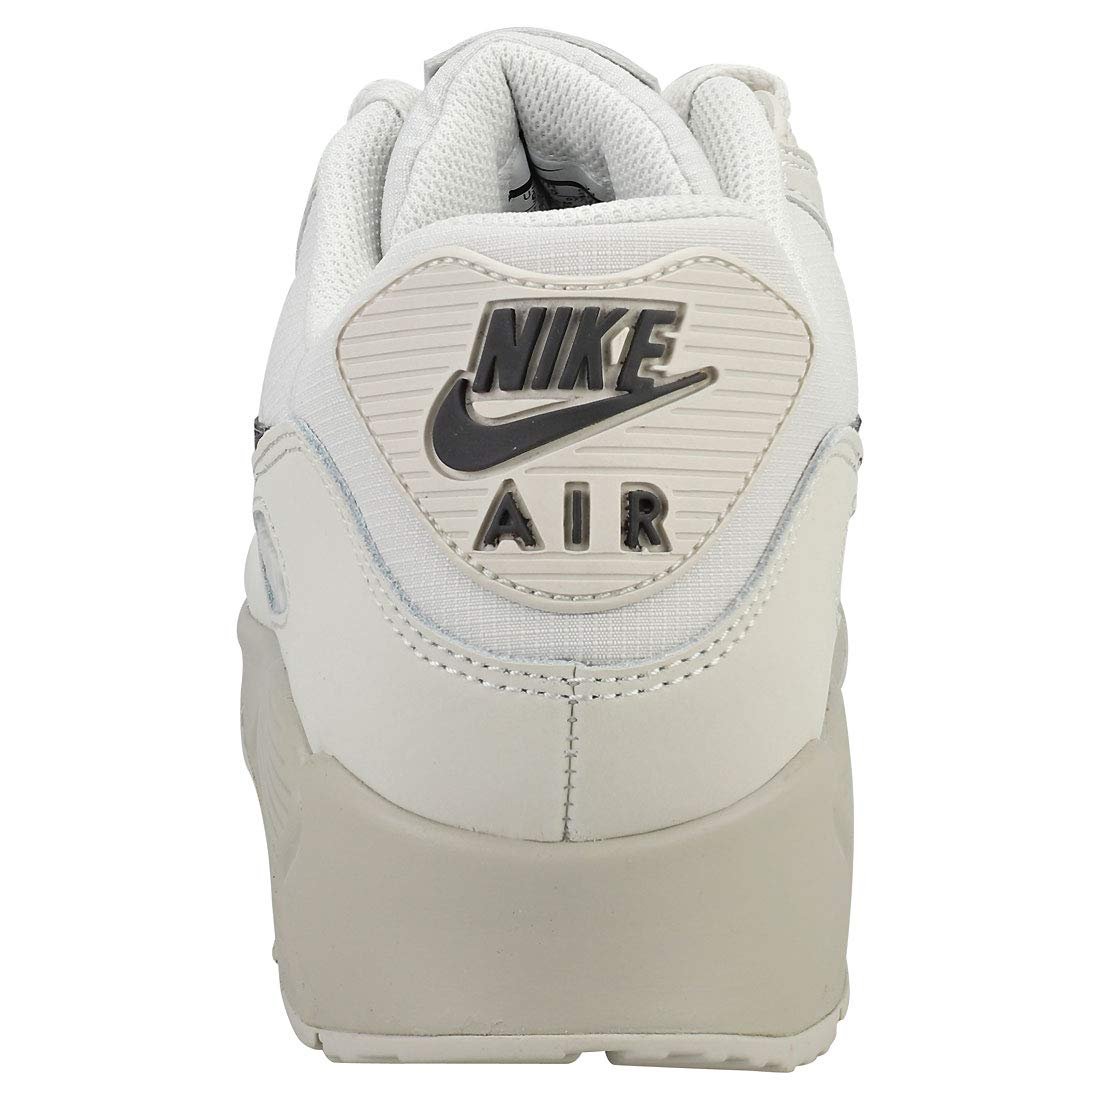 Nike Herren Air Max 90 Essential Fitnessschuhe Fitnessschuhe Fitnessschuhe B07HYXP4Y3  6cc7b1